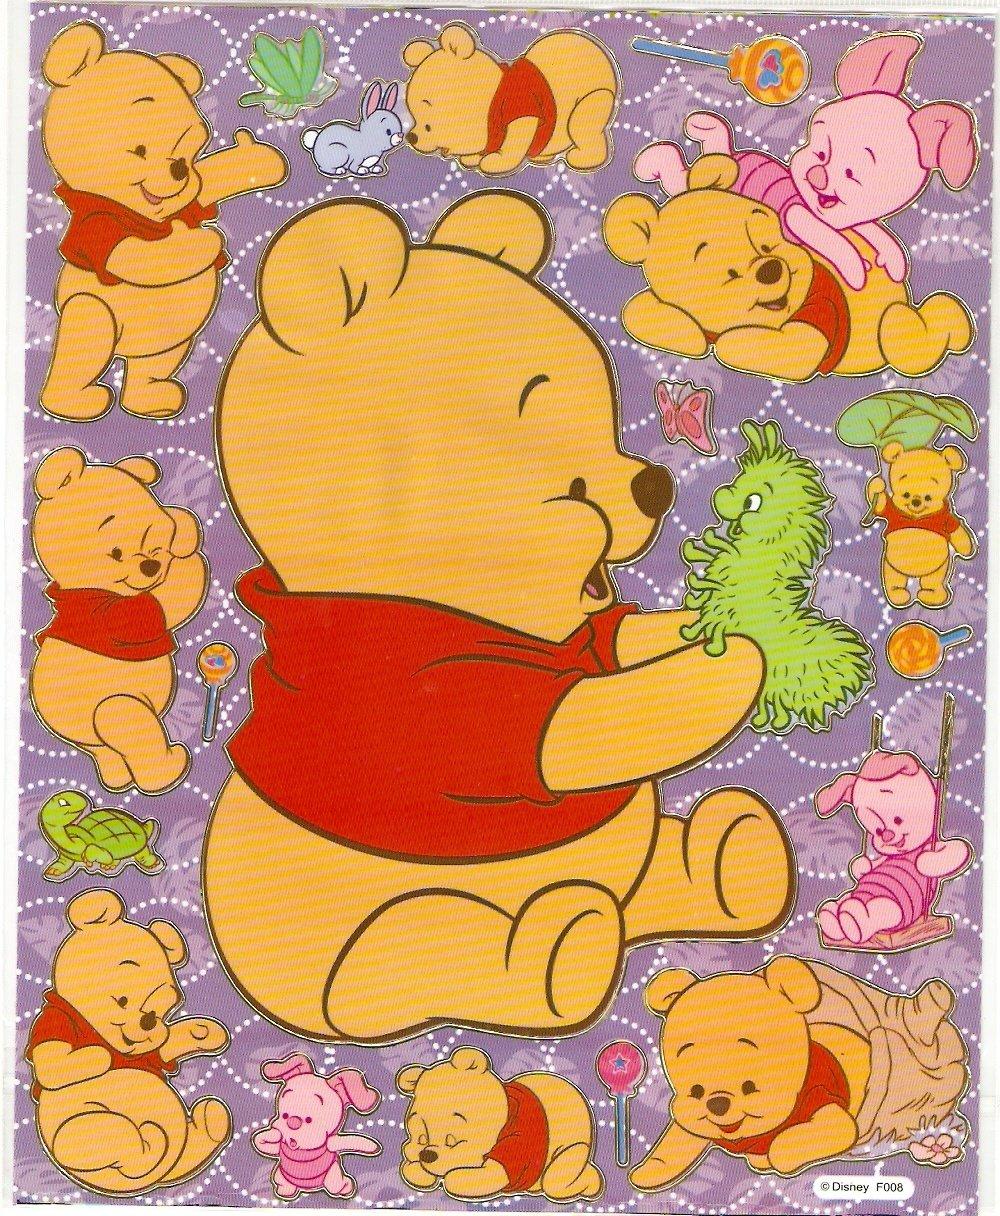 10 Big sheets Baby Pooh Sticker Buy 2 lots Bonus 1 #WP F008